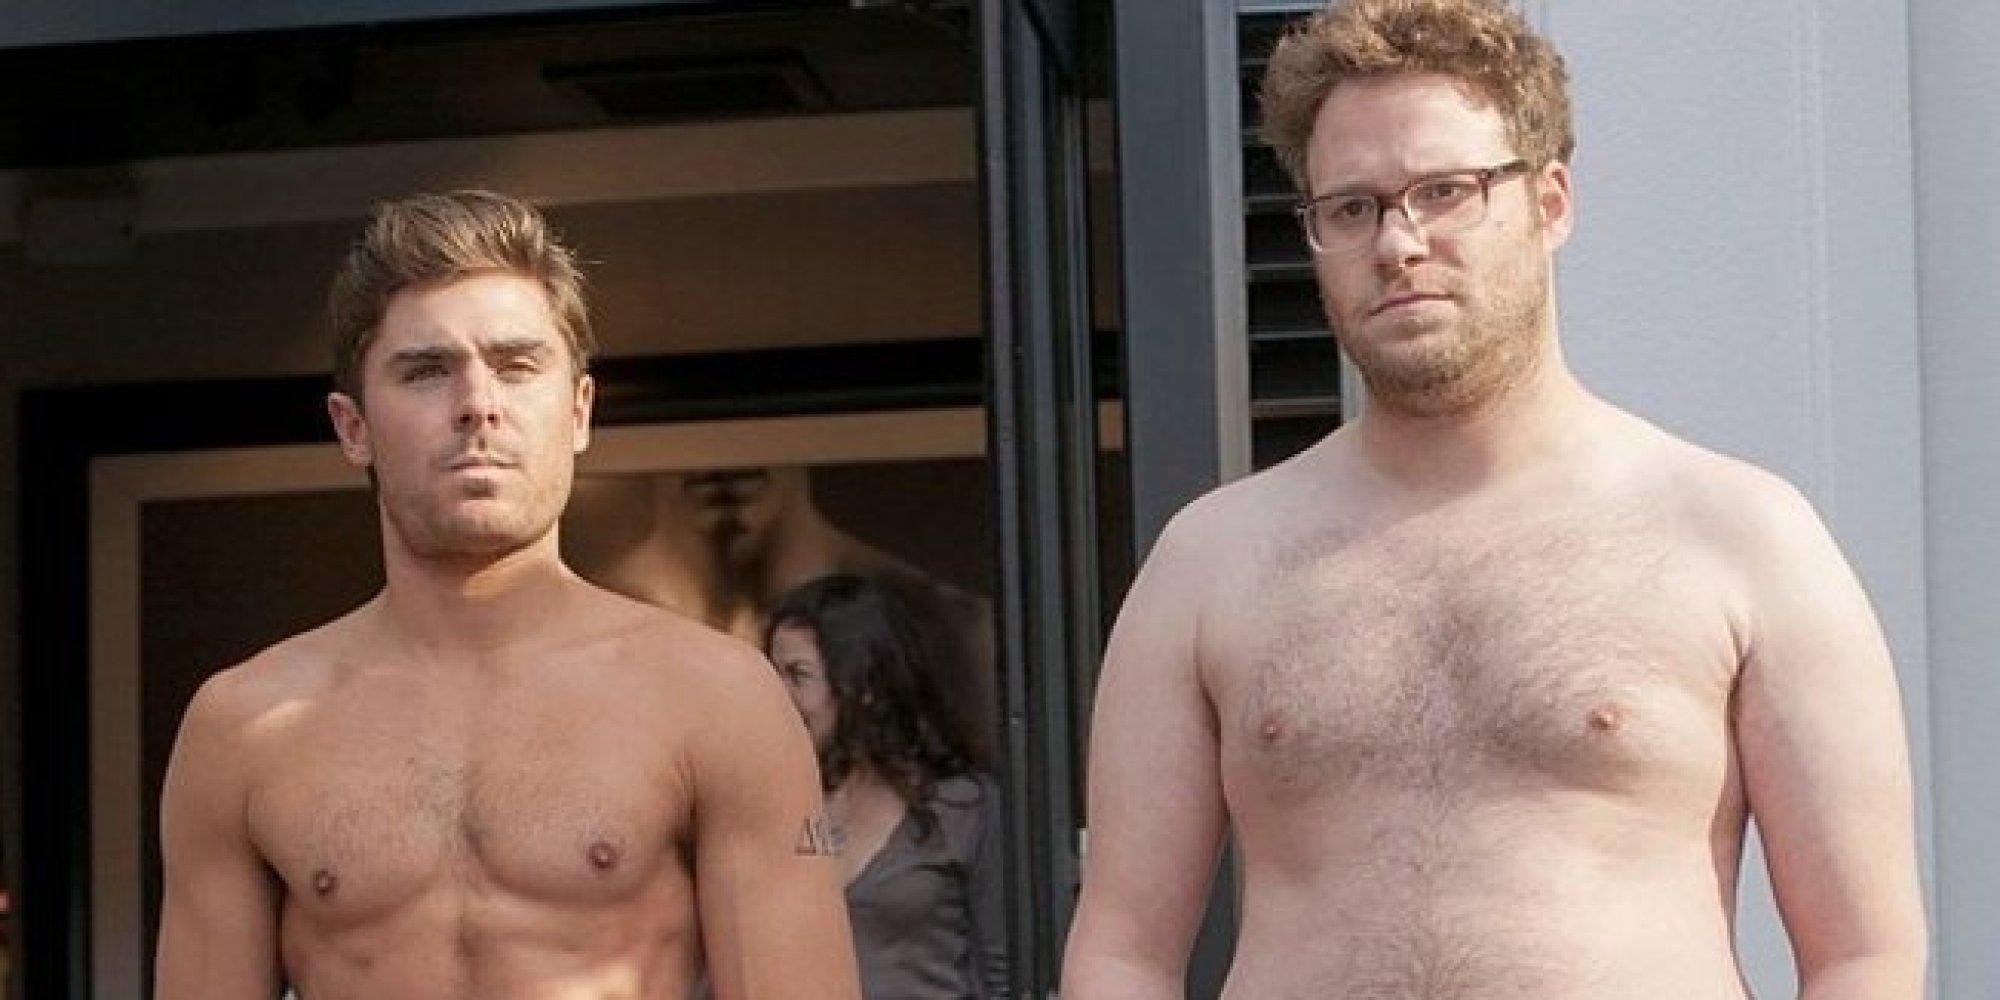 o ZAC EFRON SETH ROGEN BOUND 4 facebook Film Face off: Seth Rogen vs. Zac Efron